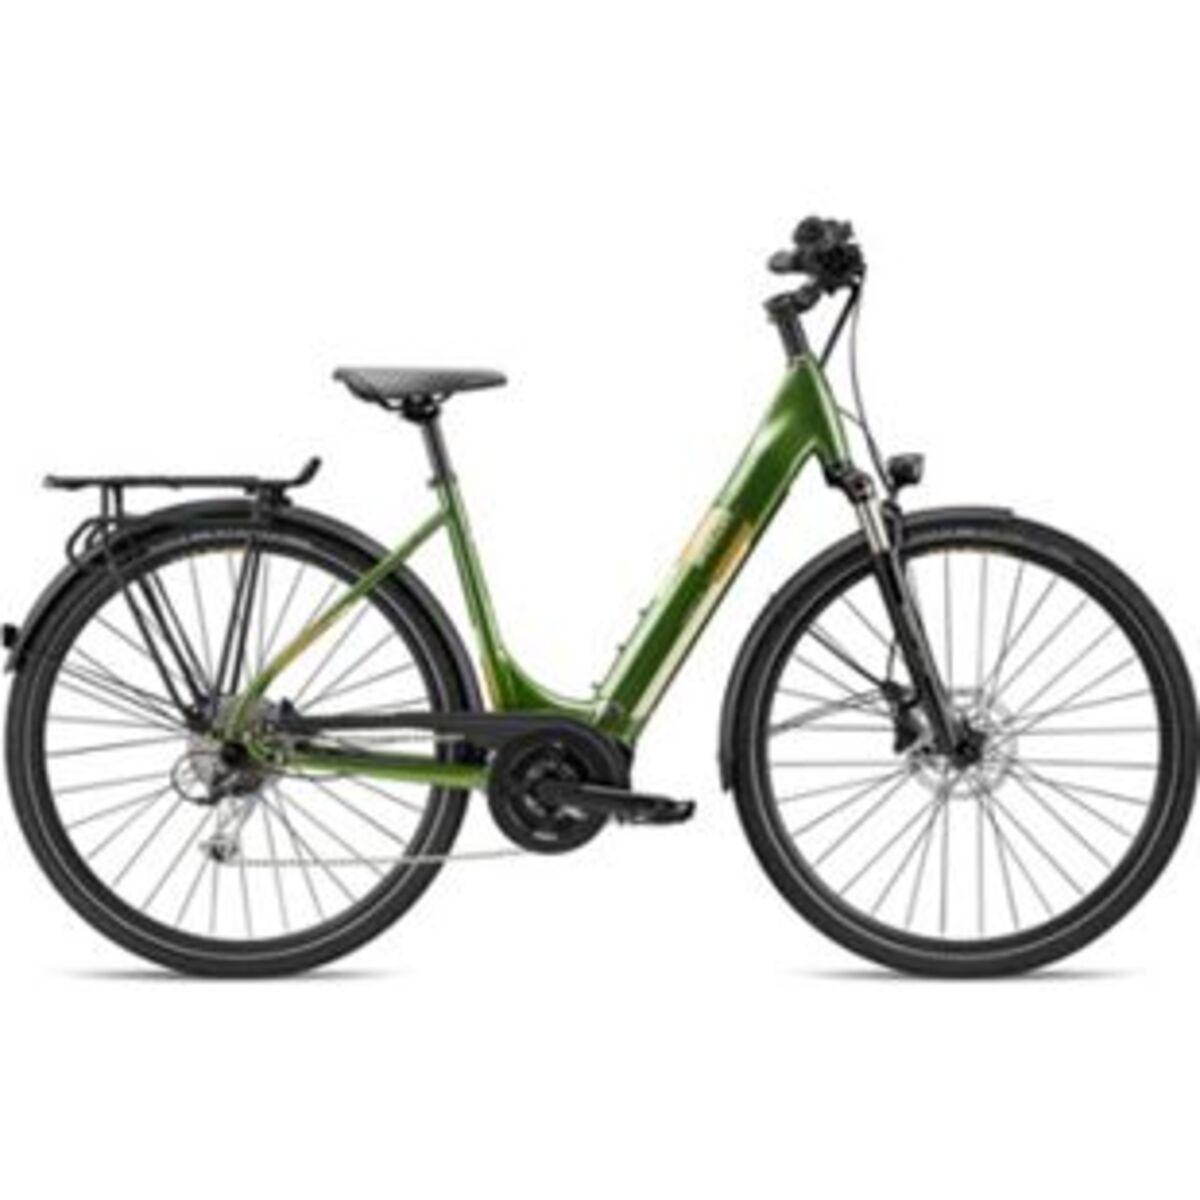 Bild 2 von Breezer Powertrip Evo 1.5+ LS 700c E-Bike Damenrad 28 Zoll Pedelec Damen Senioren Elektrofahrrad... 45 cm, grün/messing